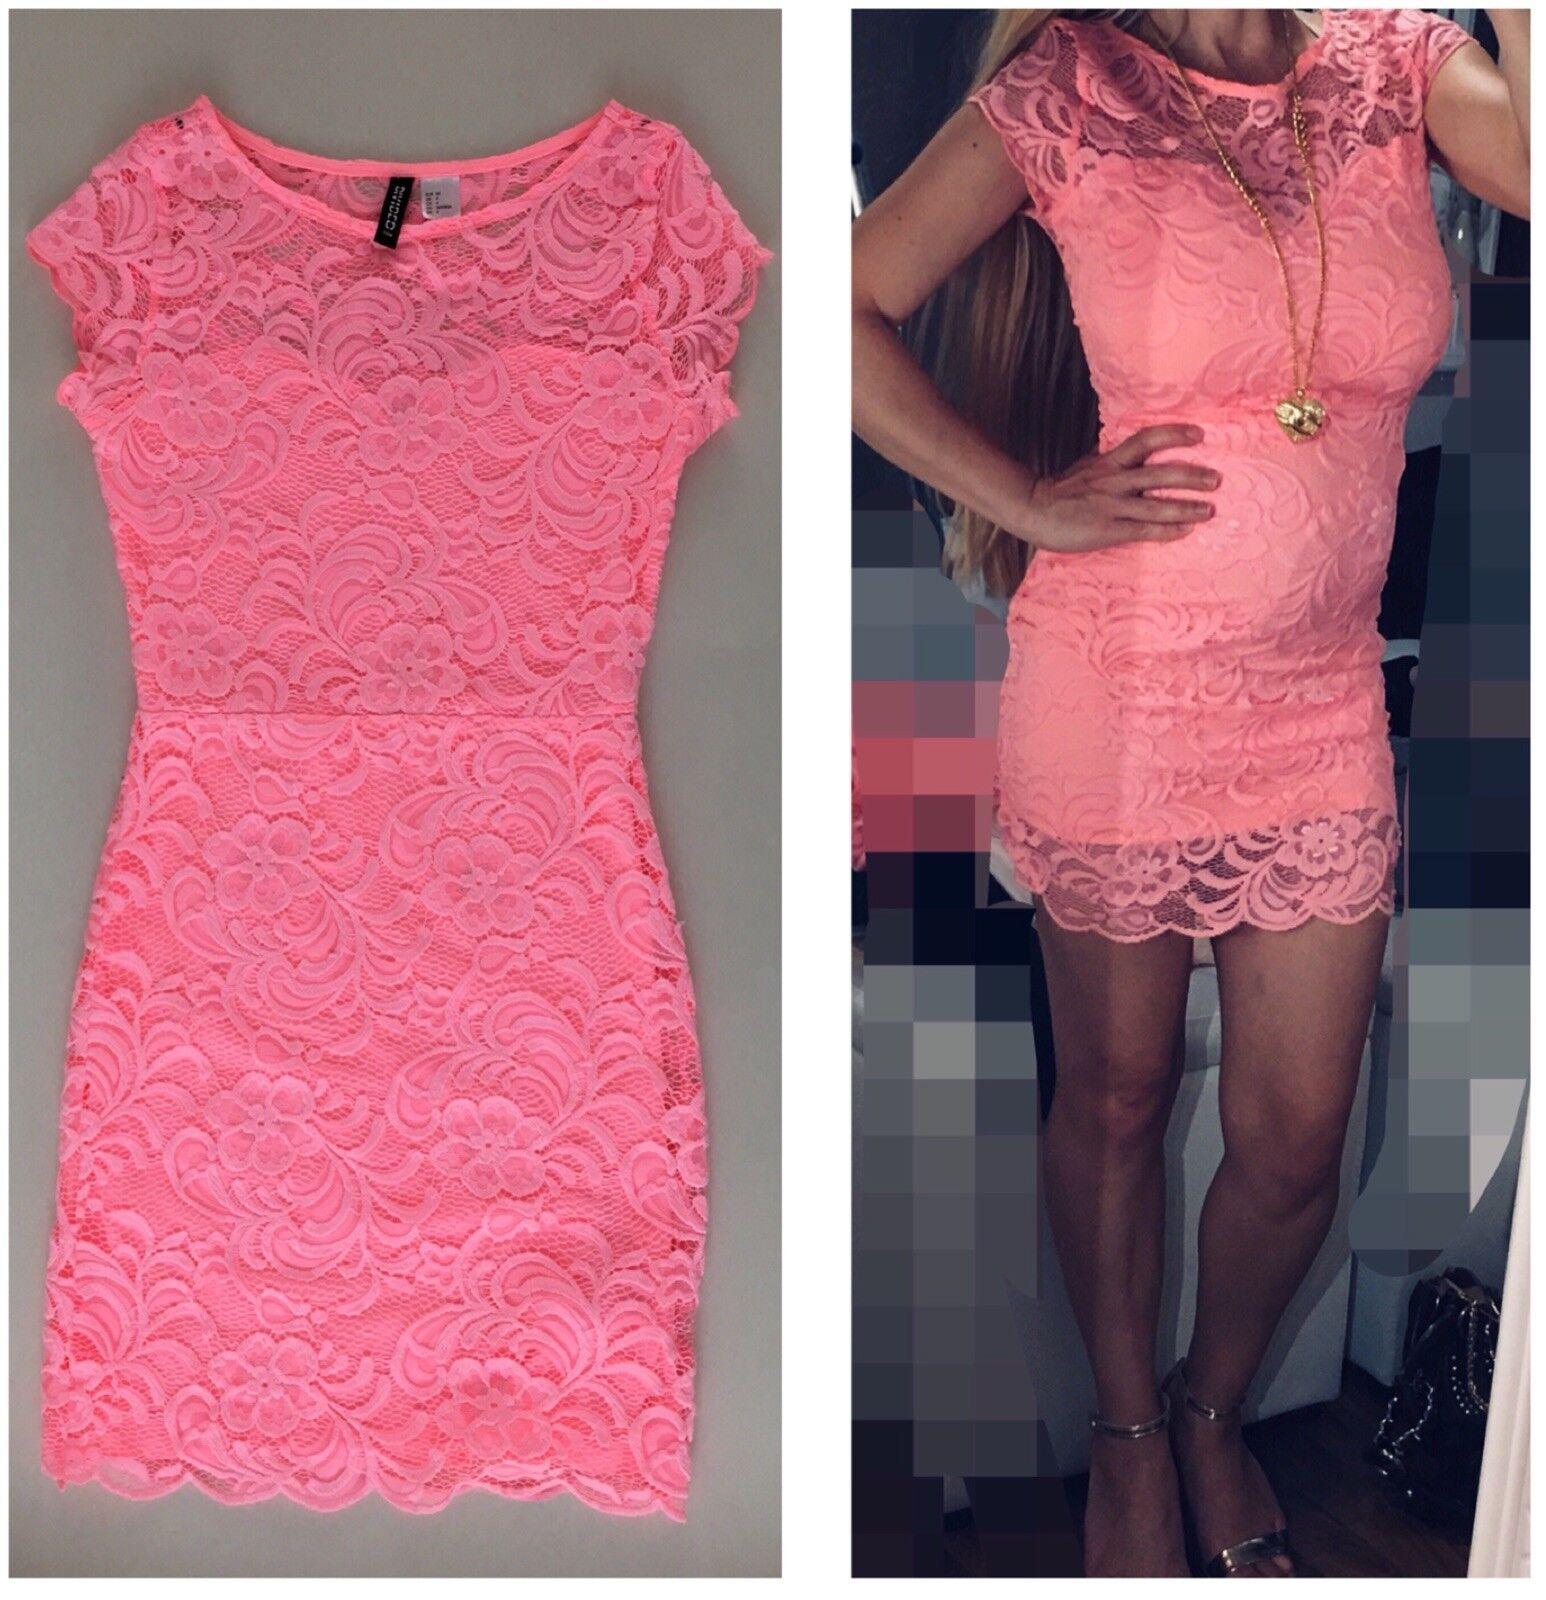 NEU H&M Kleid Top Minikleid Kleid aus Spitze Häkel Neon Rosa Rosa Gr. XS 34